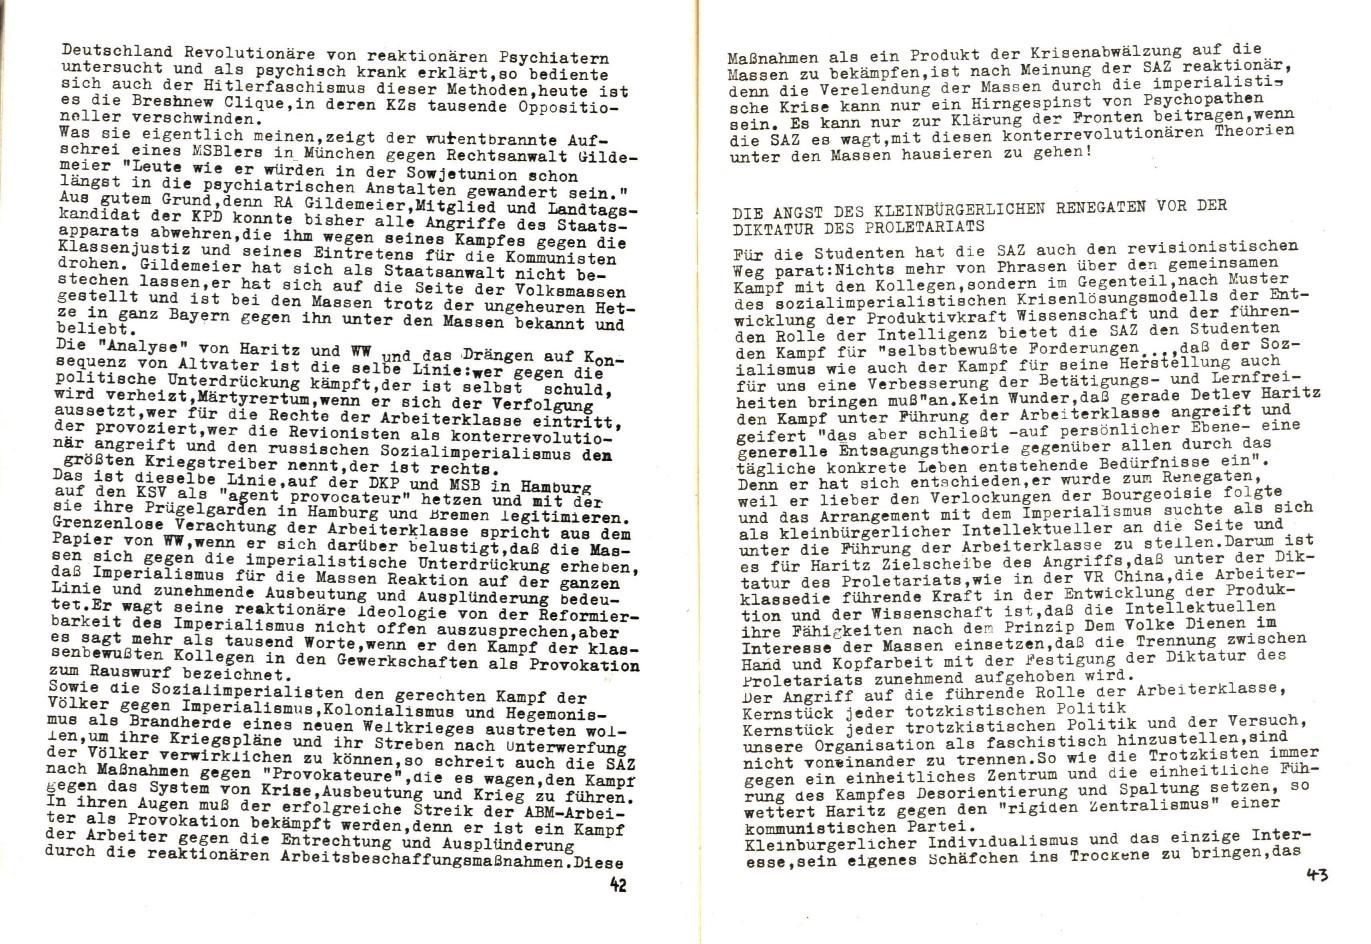 Berlin_KSV_1975_Dokumente_der_SAZ_23